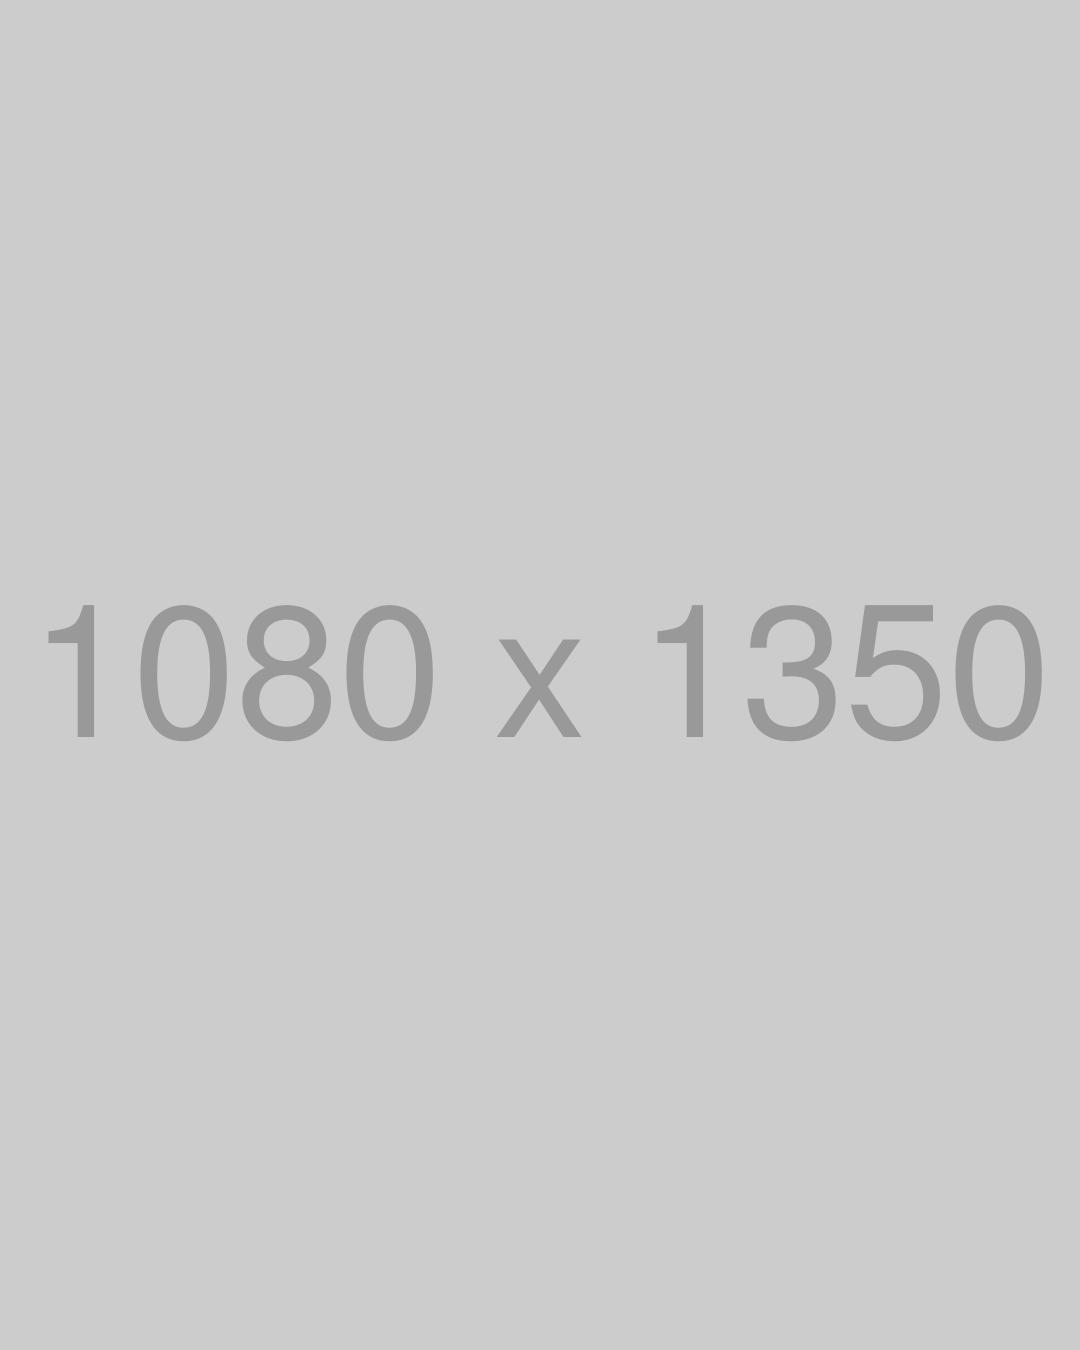 1080x1350